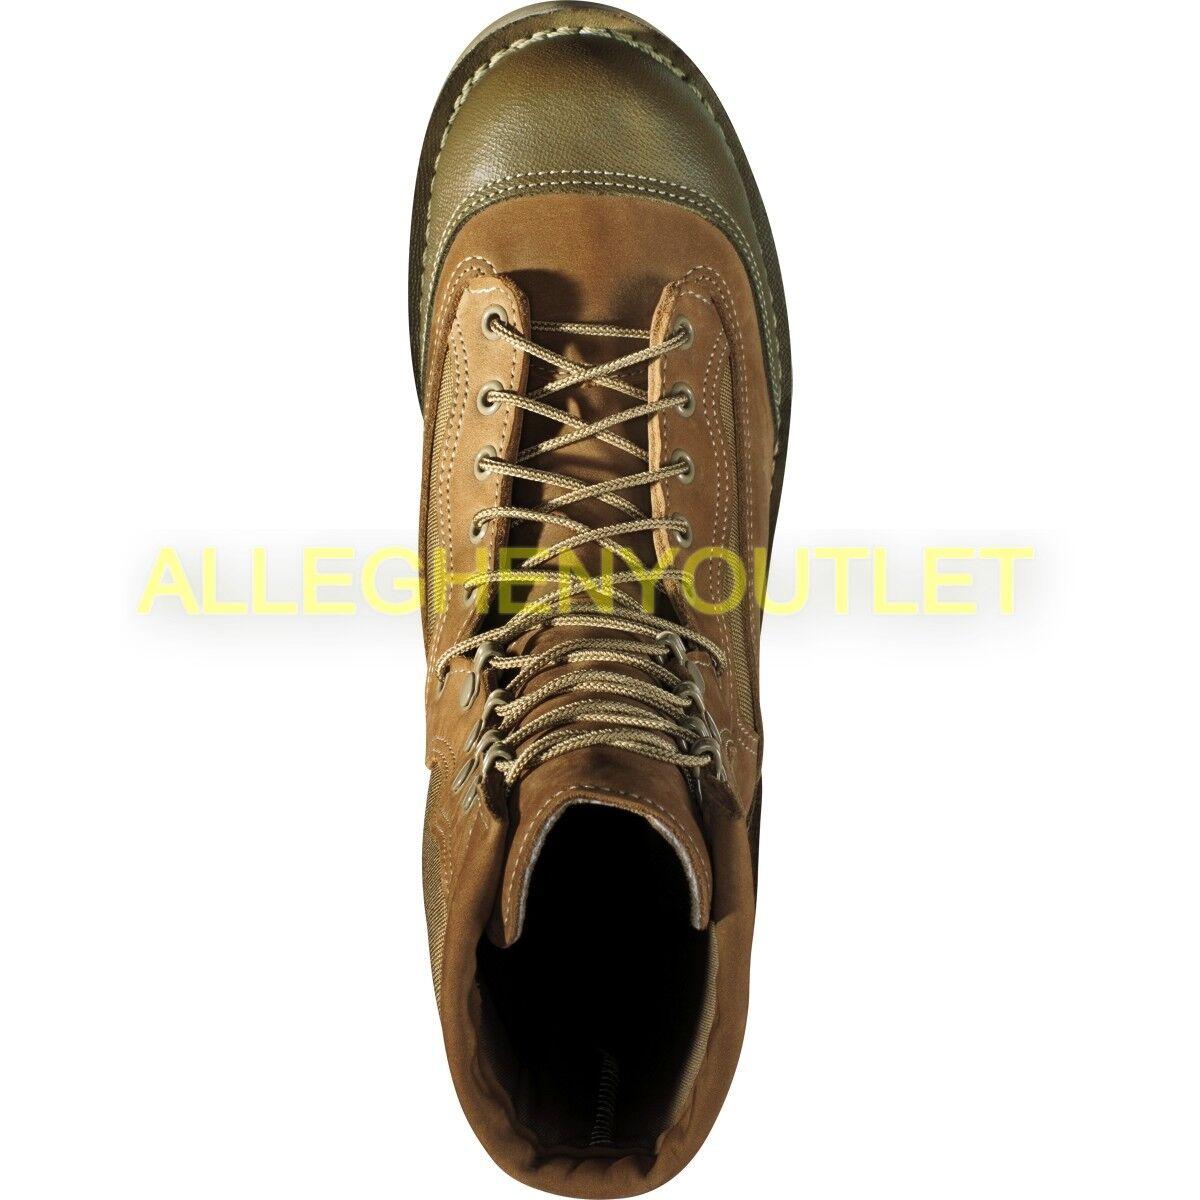 Danner USMC RAT 8  Military Leather Leather Leather stivali Mojave GTX GoreTex 15678 Sz 6.5-9 NEW 413d4f